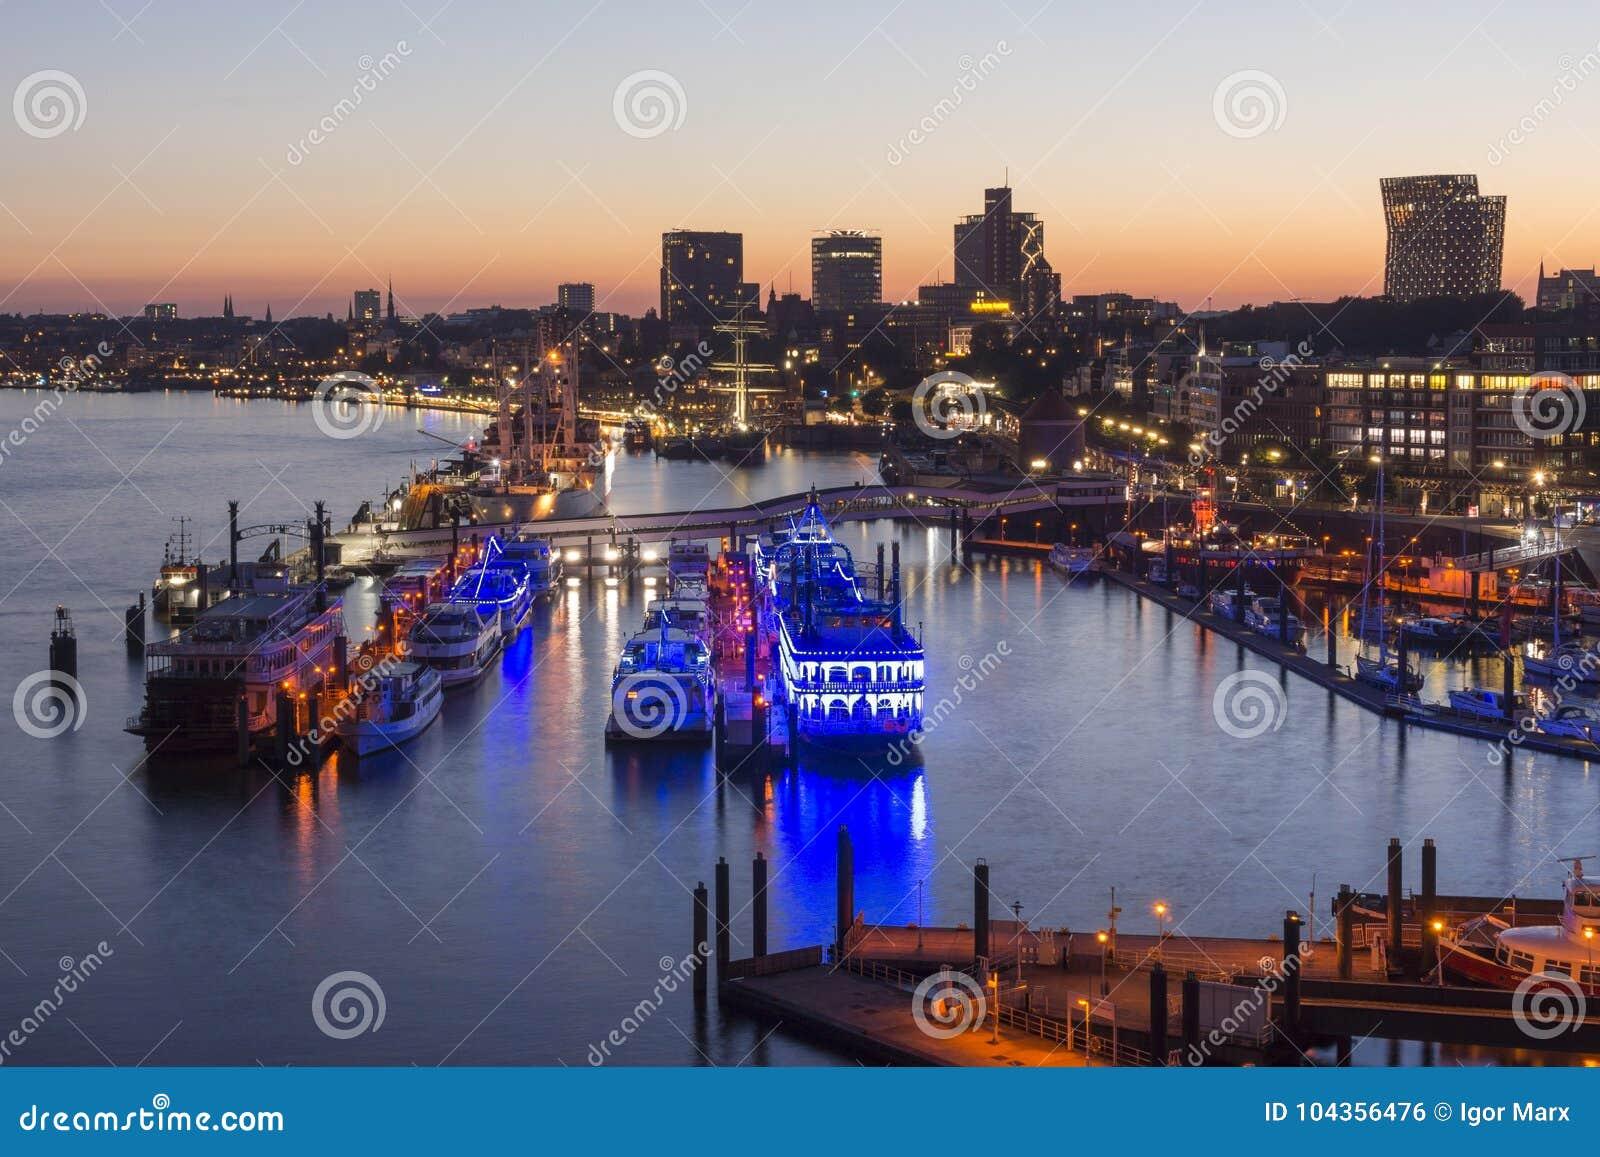 Гамбург, Германия - 18-ое июня 2017: Гавань Гамбурга на вечере лета